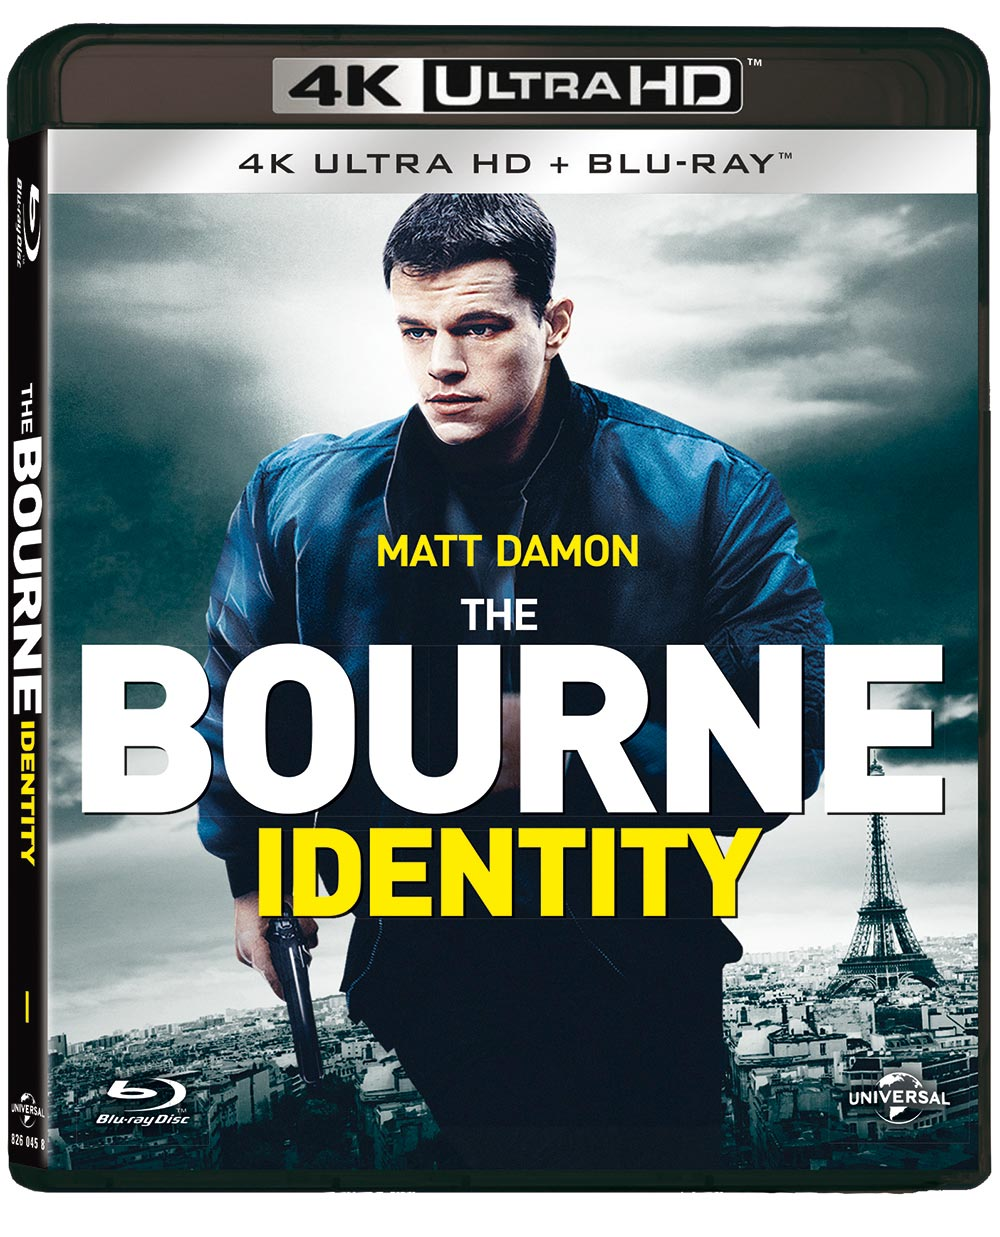 THE BOURNE IDENTITY (BLU-RAY 4K ULTRA HD+BLU-RAY)